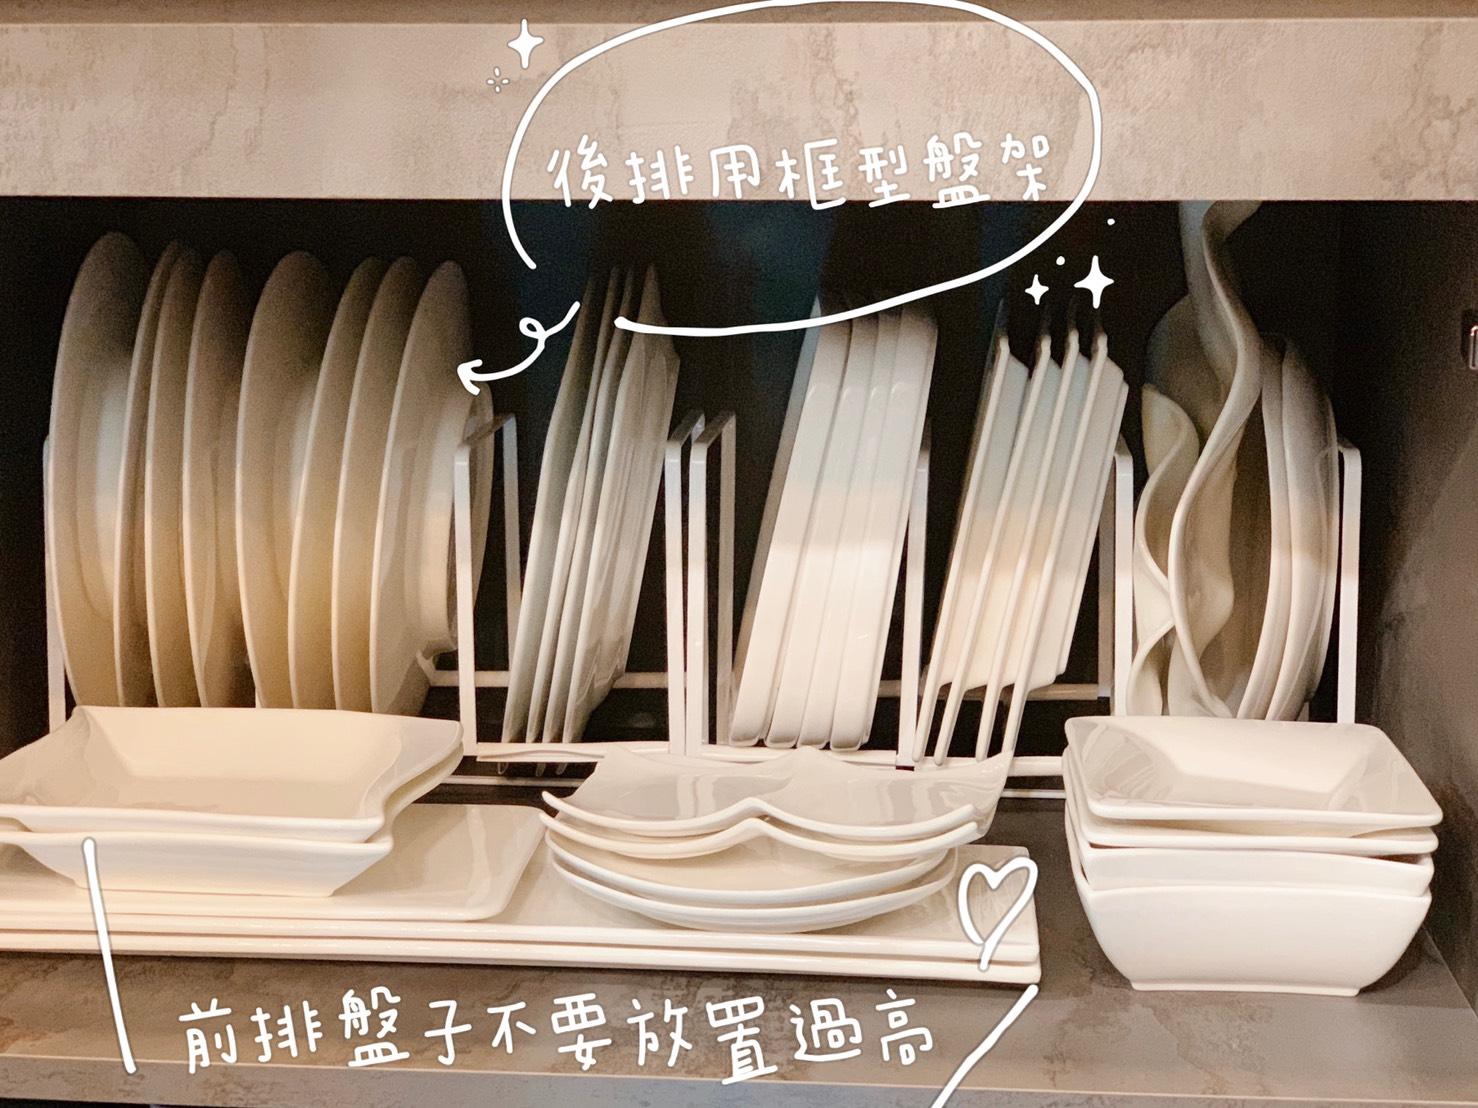 tower三格日系框型盤架(白) 山崎收納 Yamazaki 廚房收納 盤架